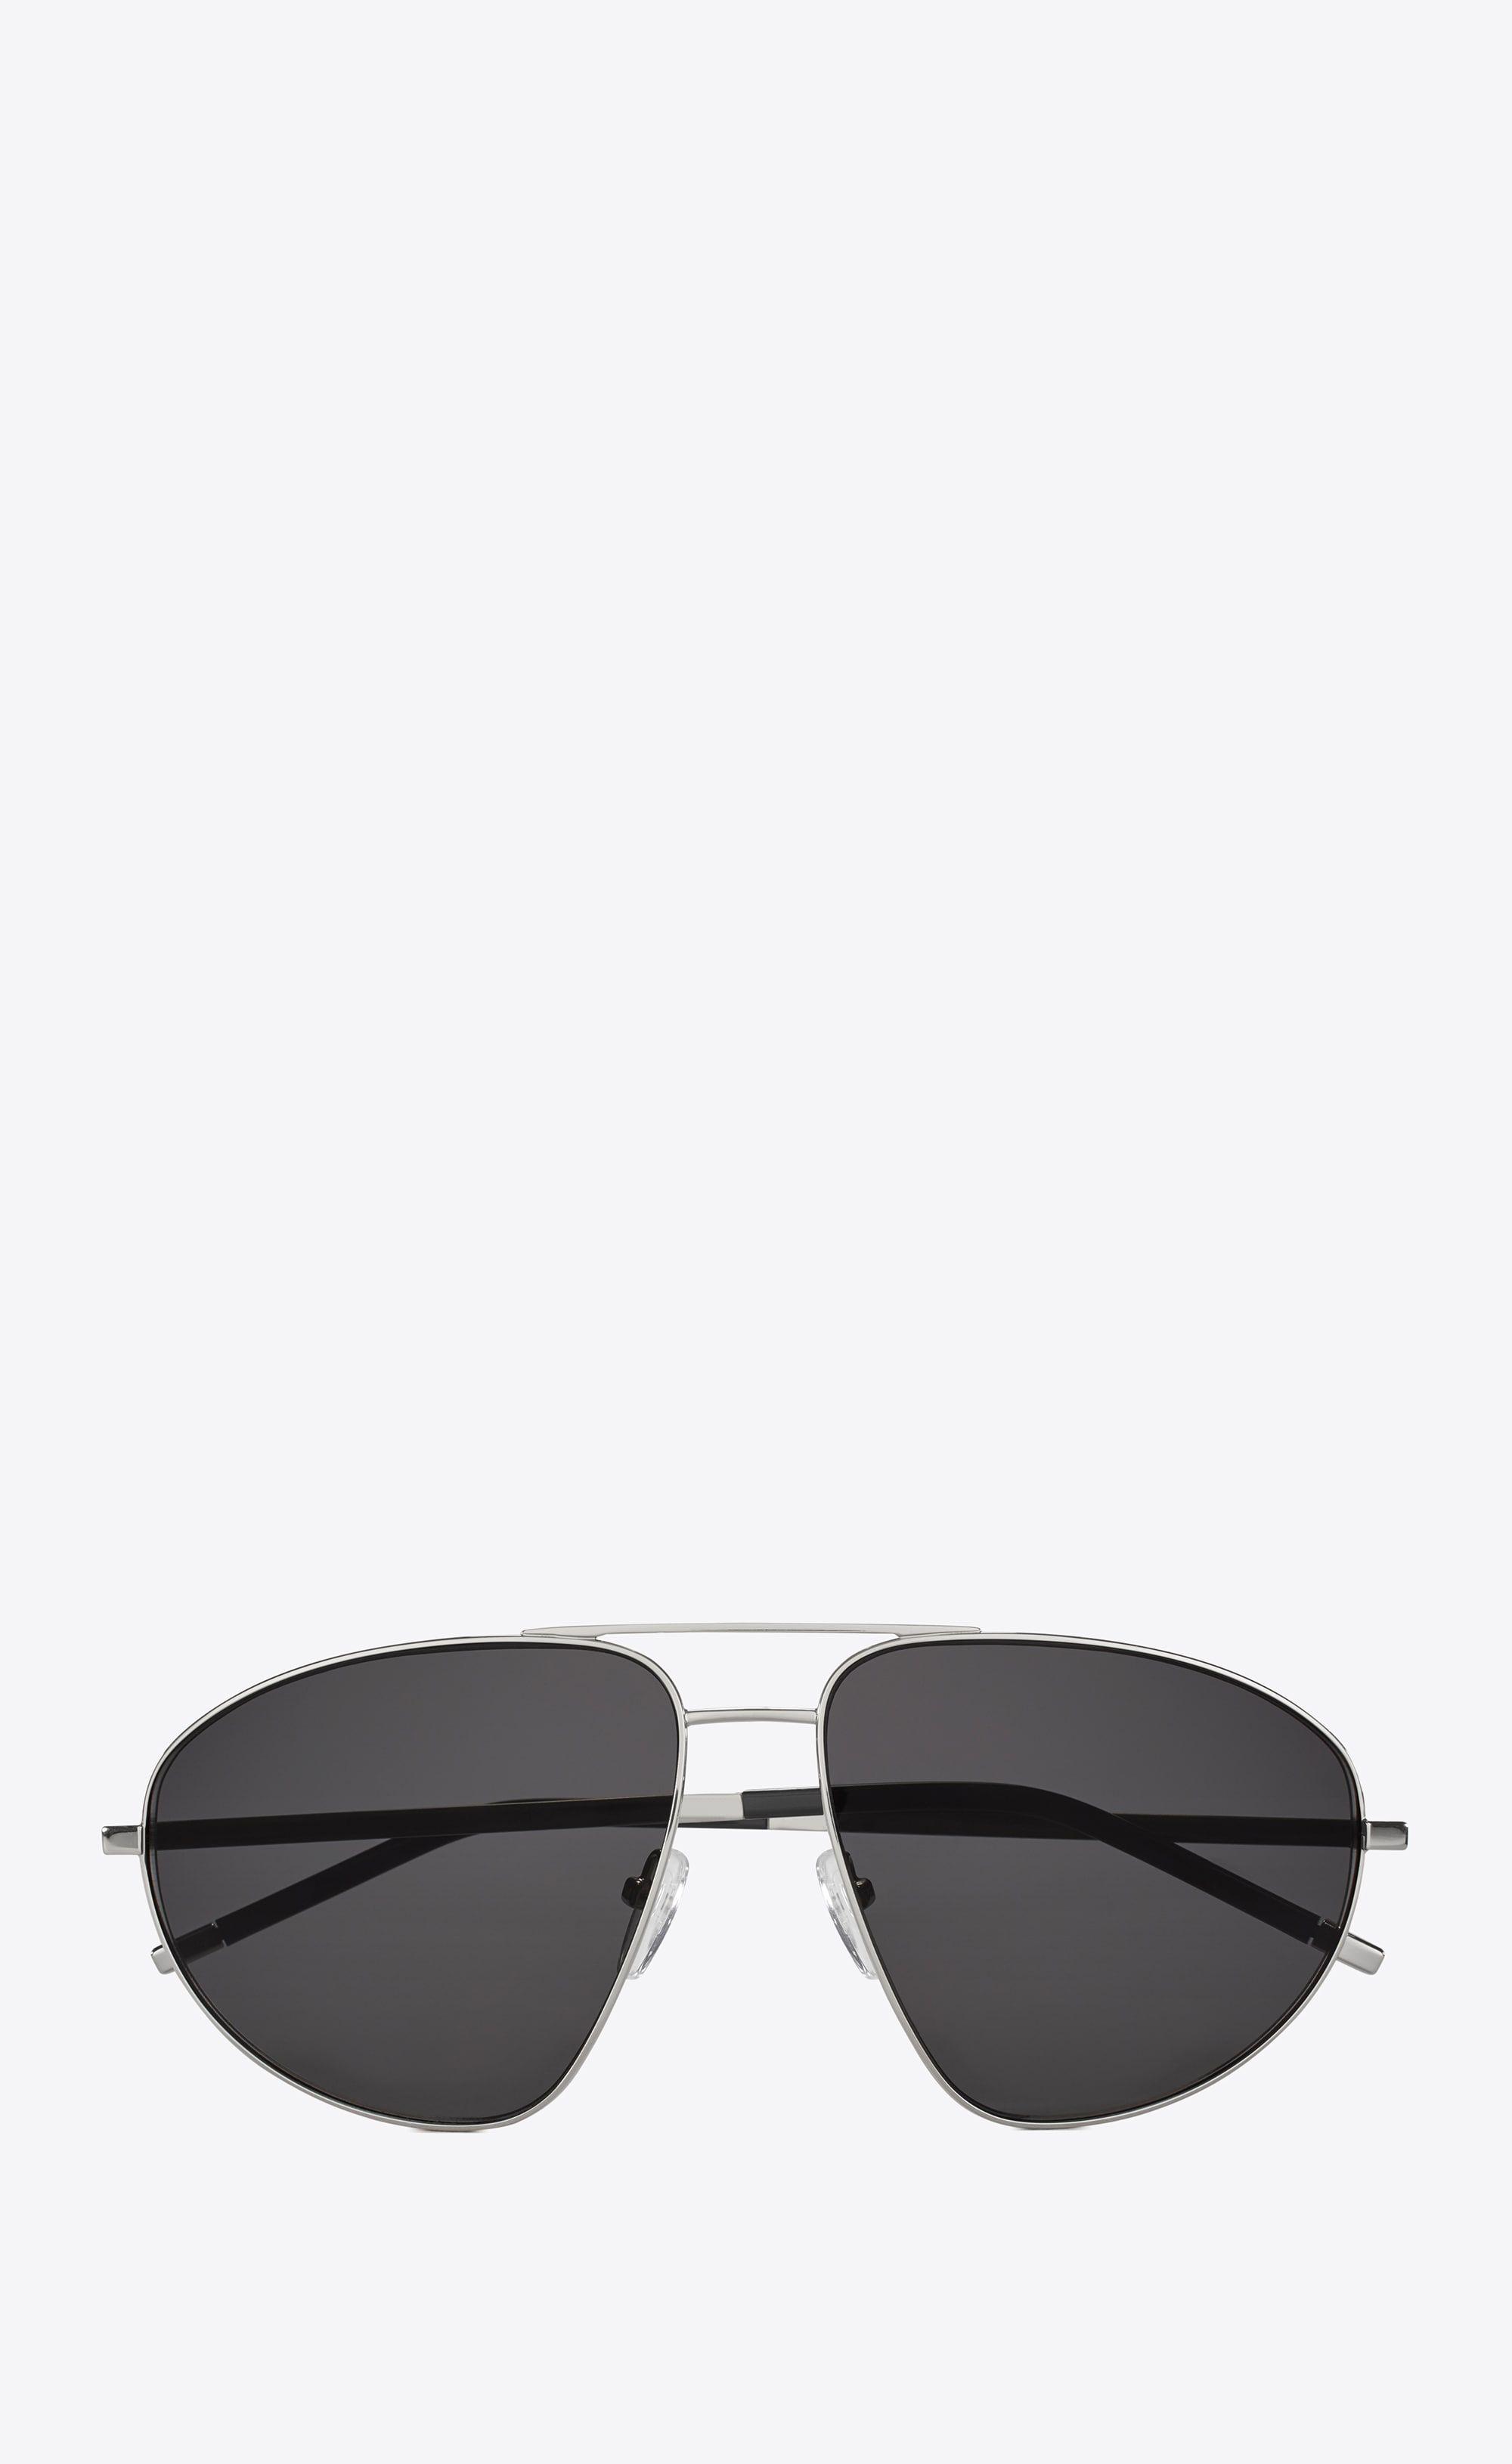 c46ac4749f0 Saint Laurent - Classic 2 sunglasses in silver metal, black acetate and  gray lenses ($405)